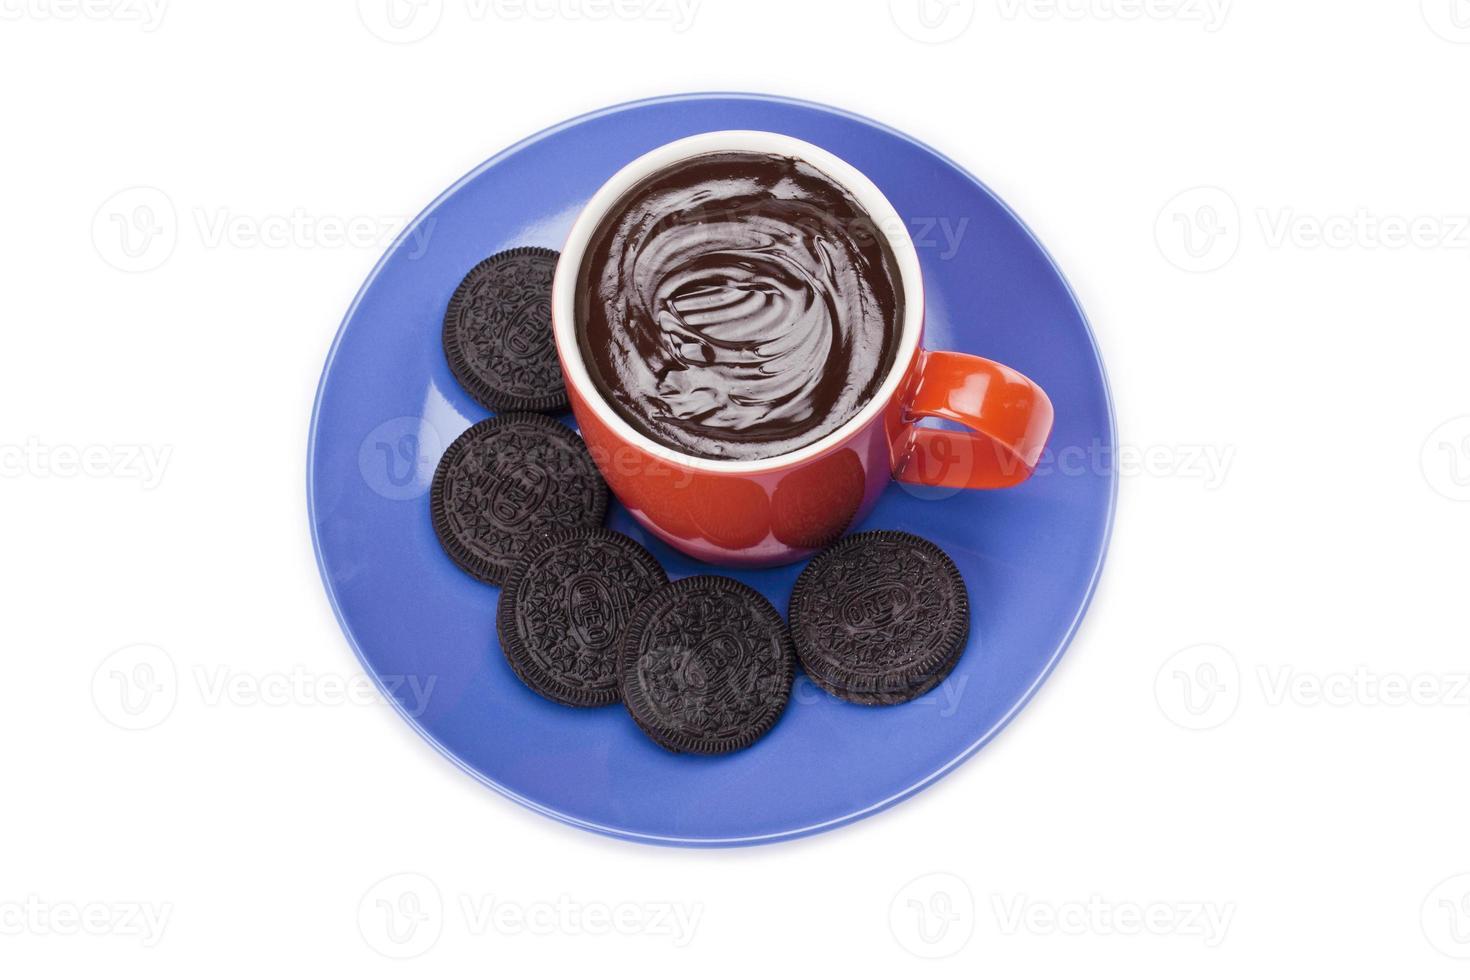 biscuits enrobés de chocolat photo